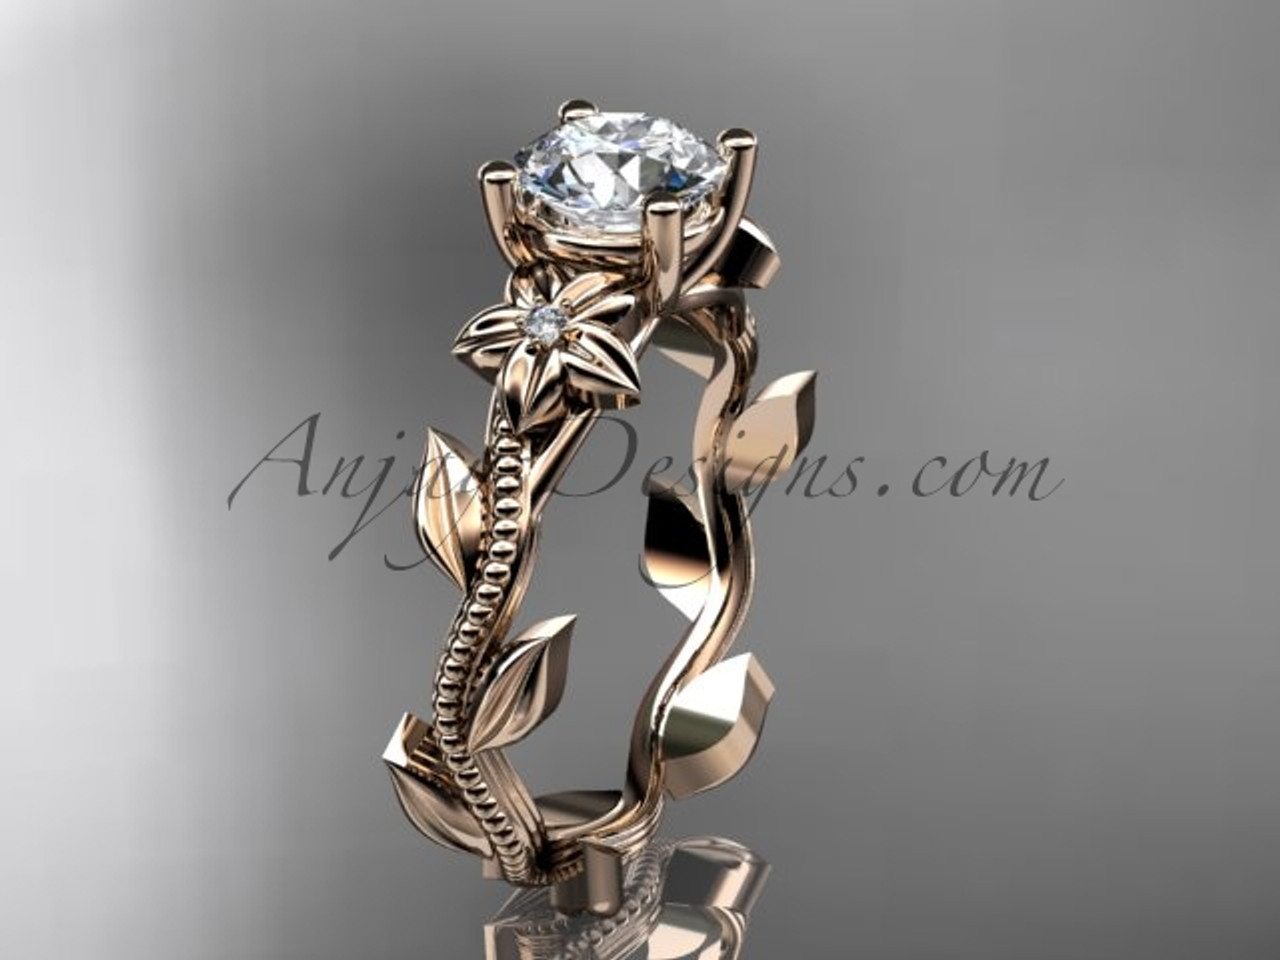 Rose Gold Ring Design For Female Unique Flower Rings Adlr238